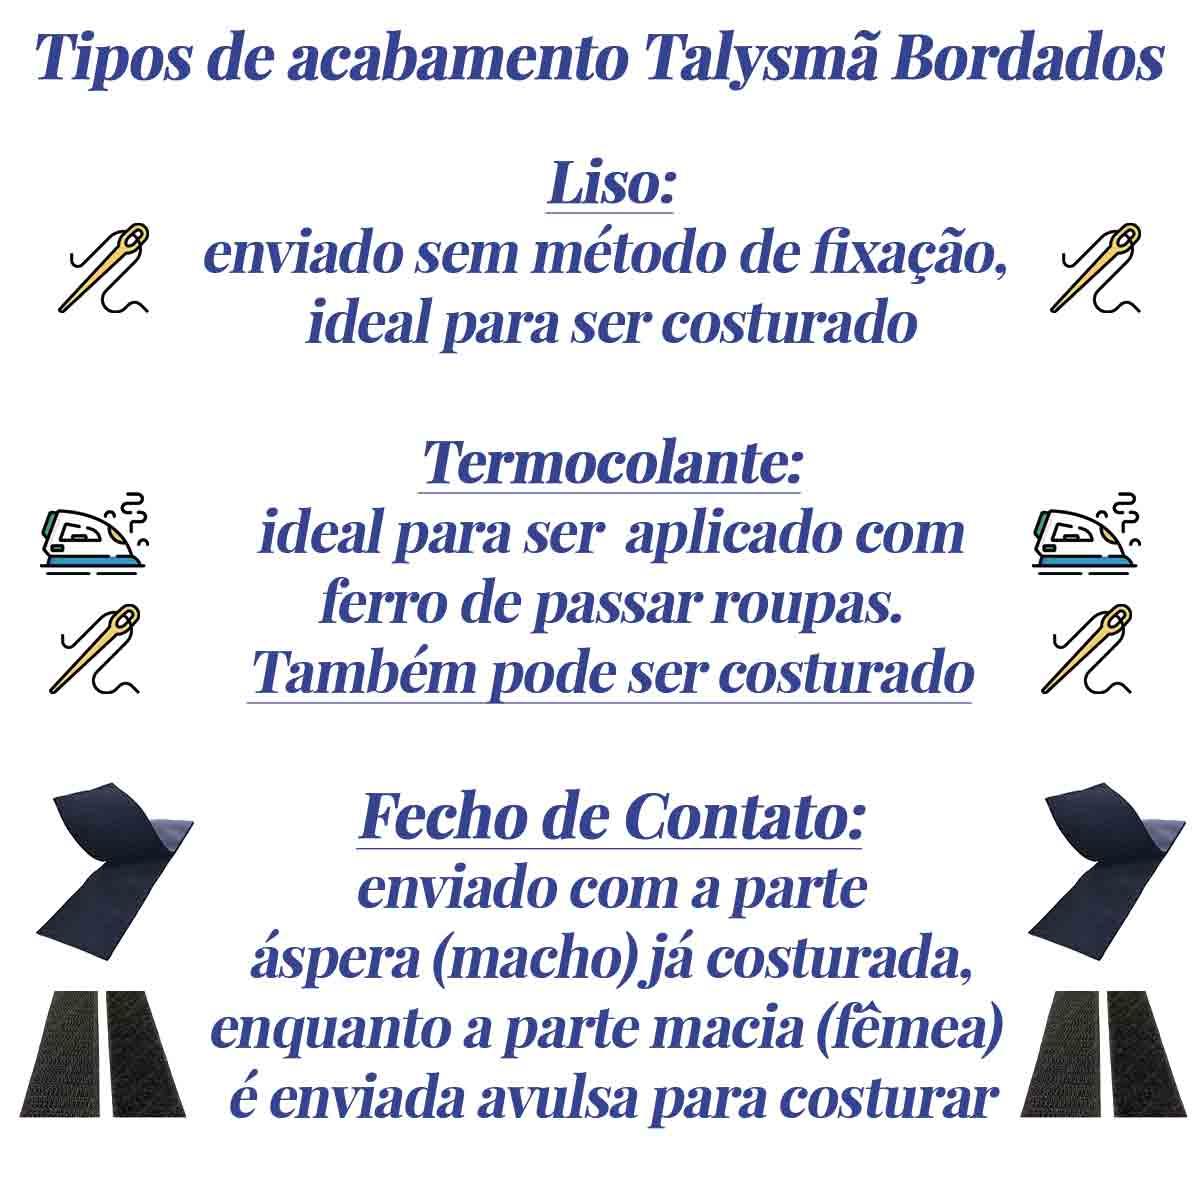 Patch Bordado - Caveira Justiceiro The Punisher Redonda DV80829-183  - Talysmã Bordados